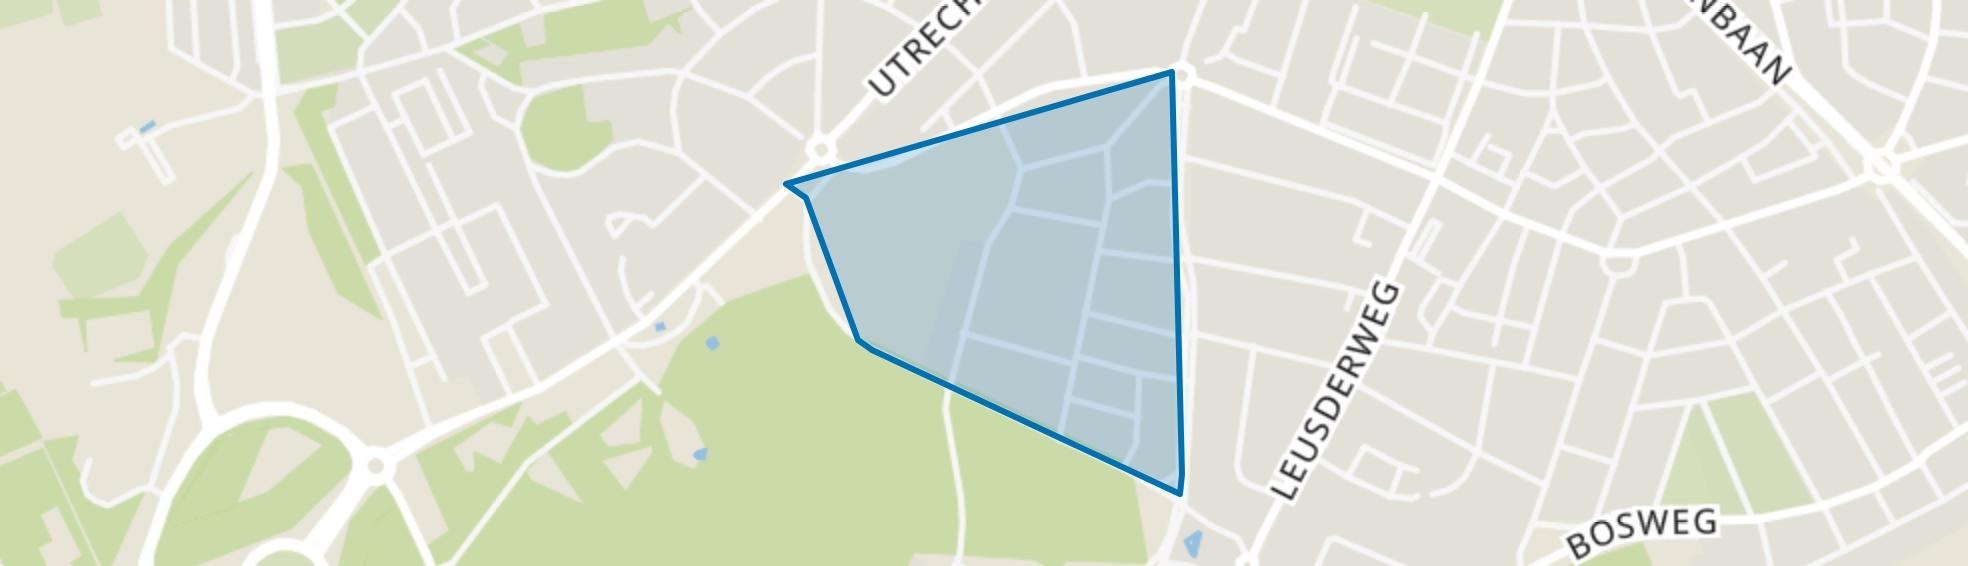 De Lichtenberg, Amersfoort map